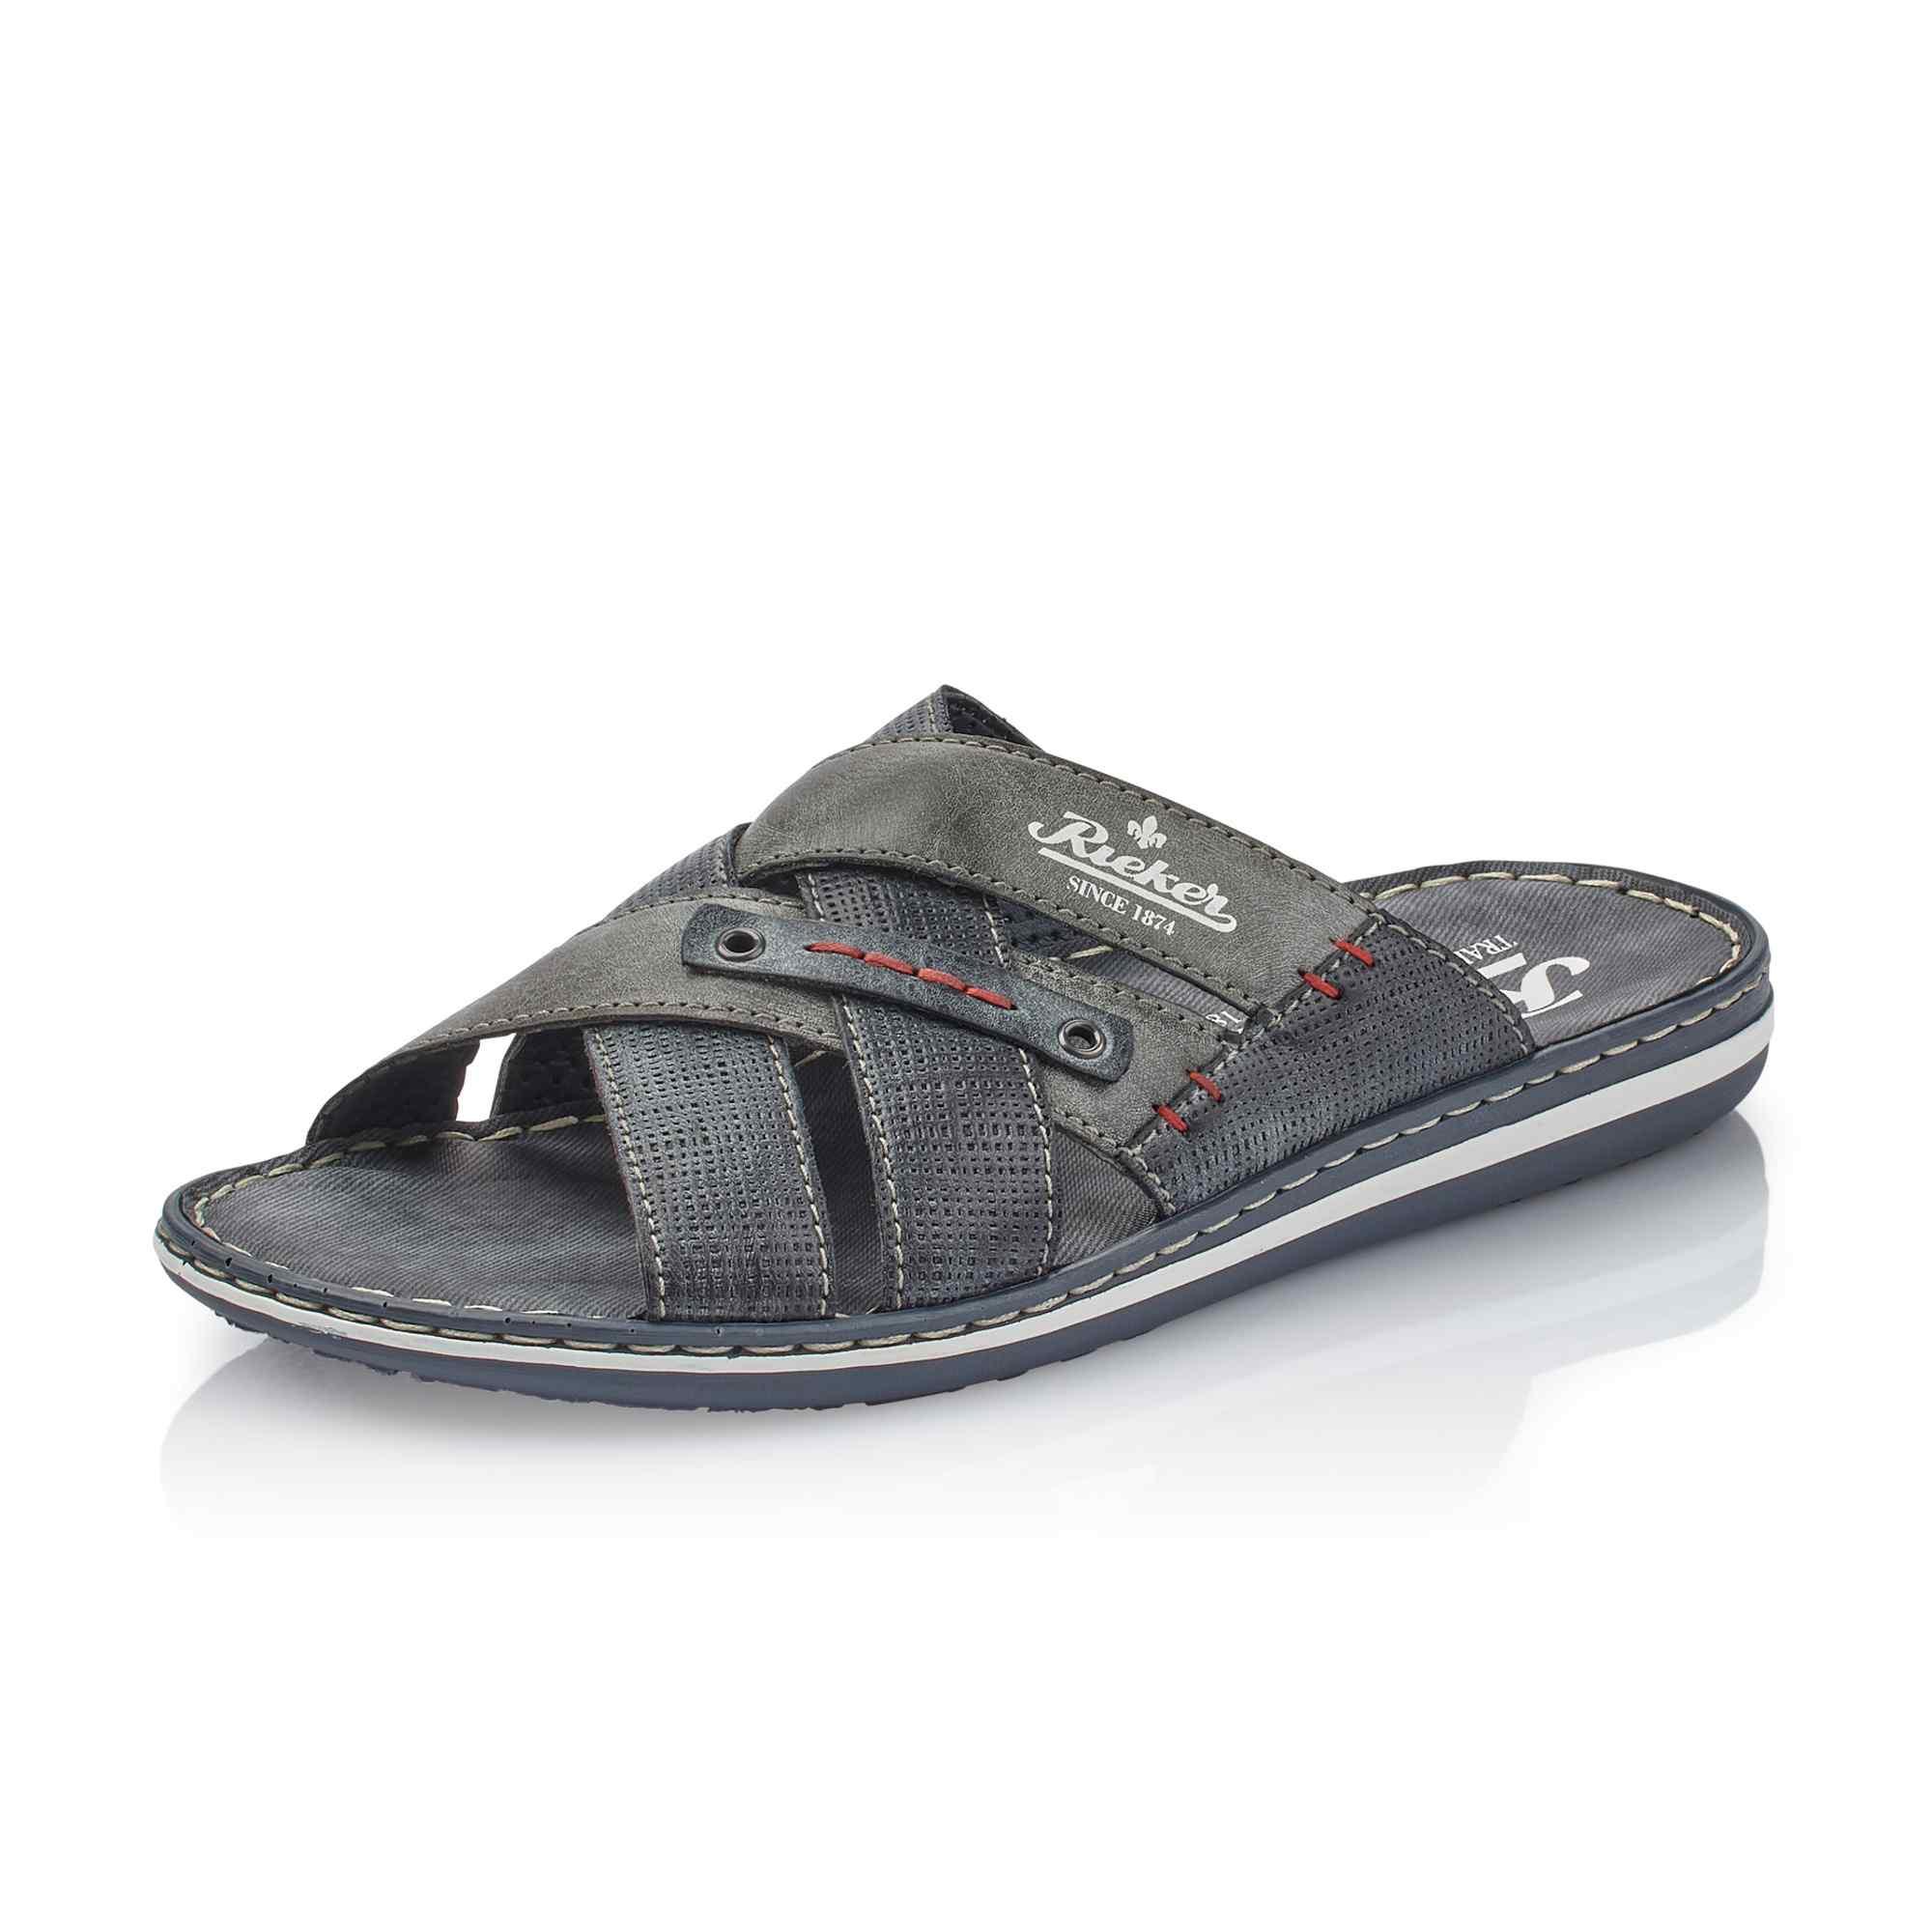 01dbc6f4c2 detail Pánská obuv RIEKER 21062-15 BLAU F S 9